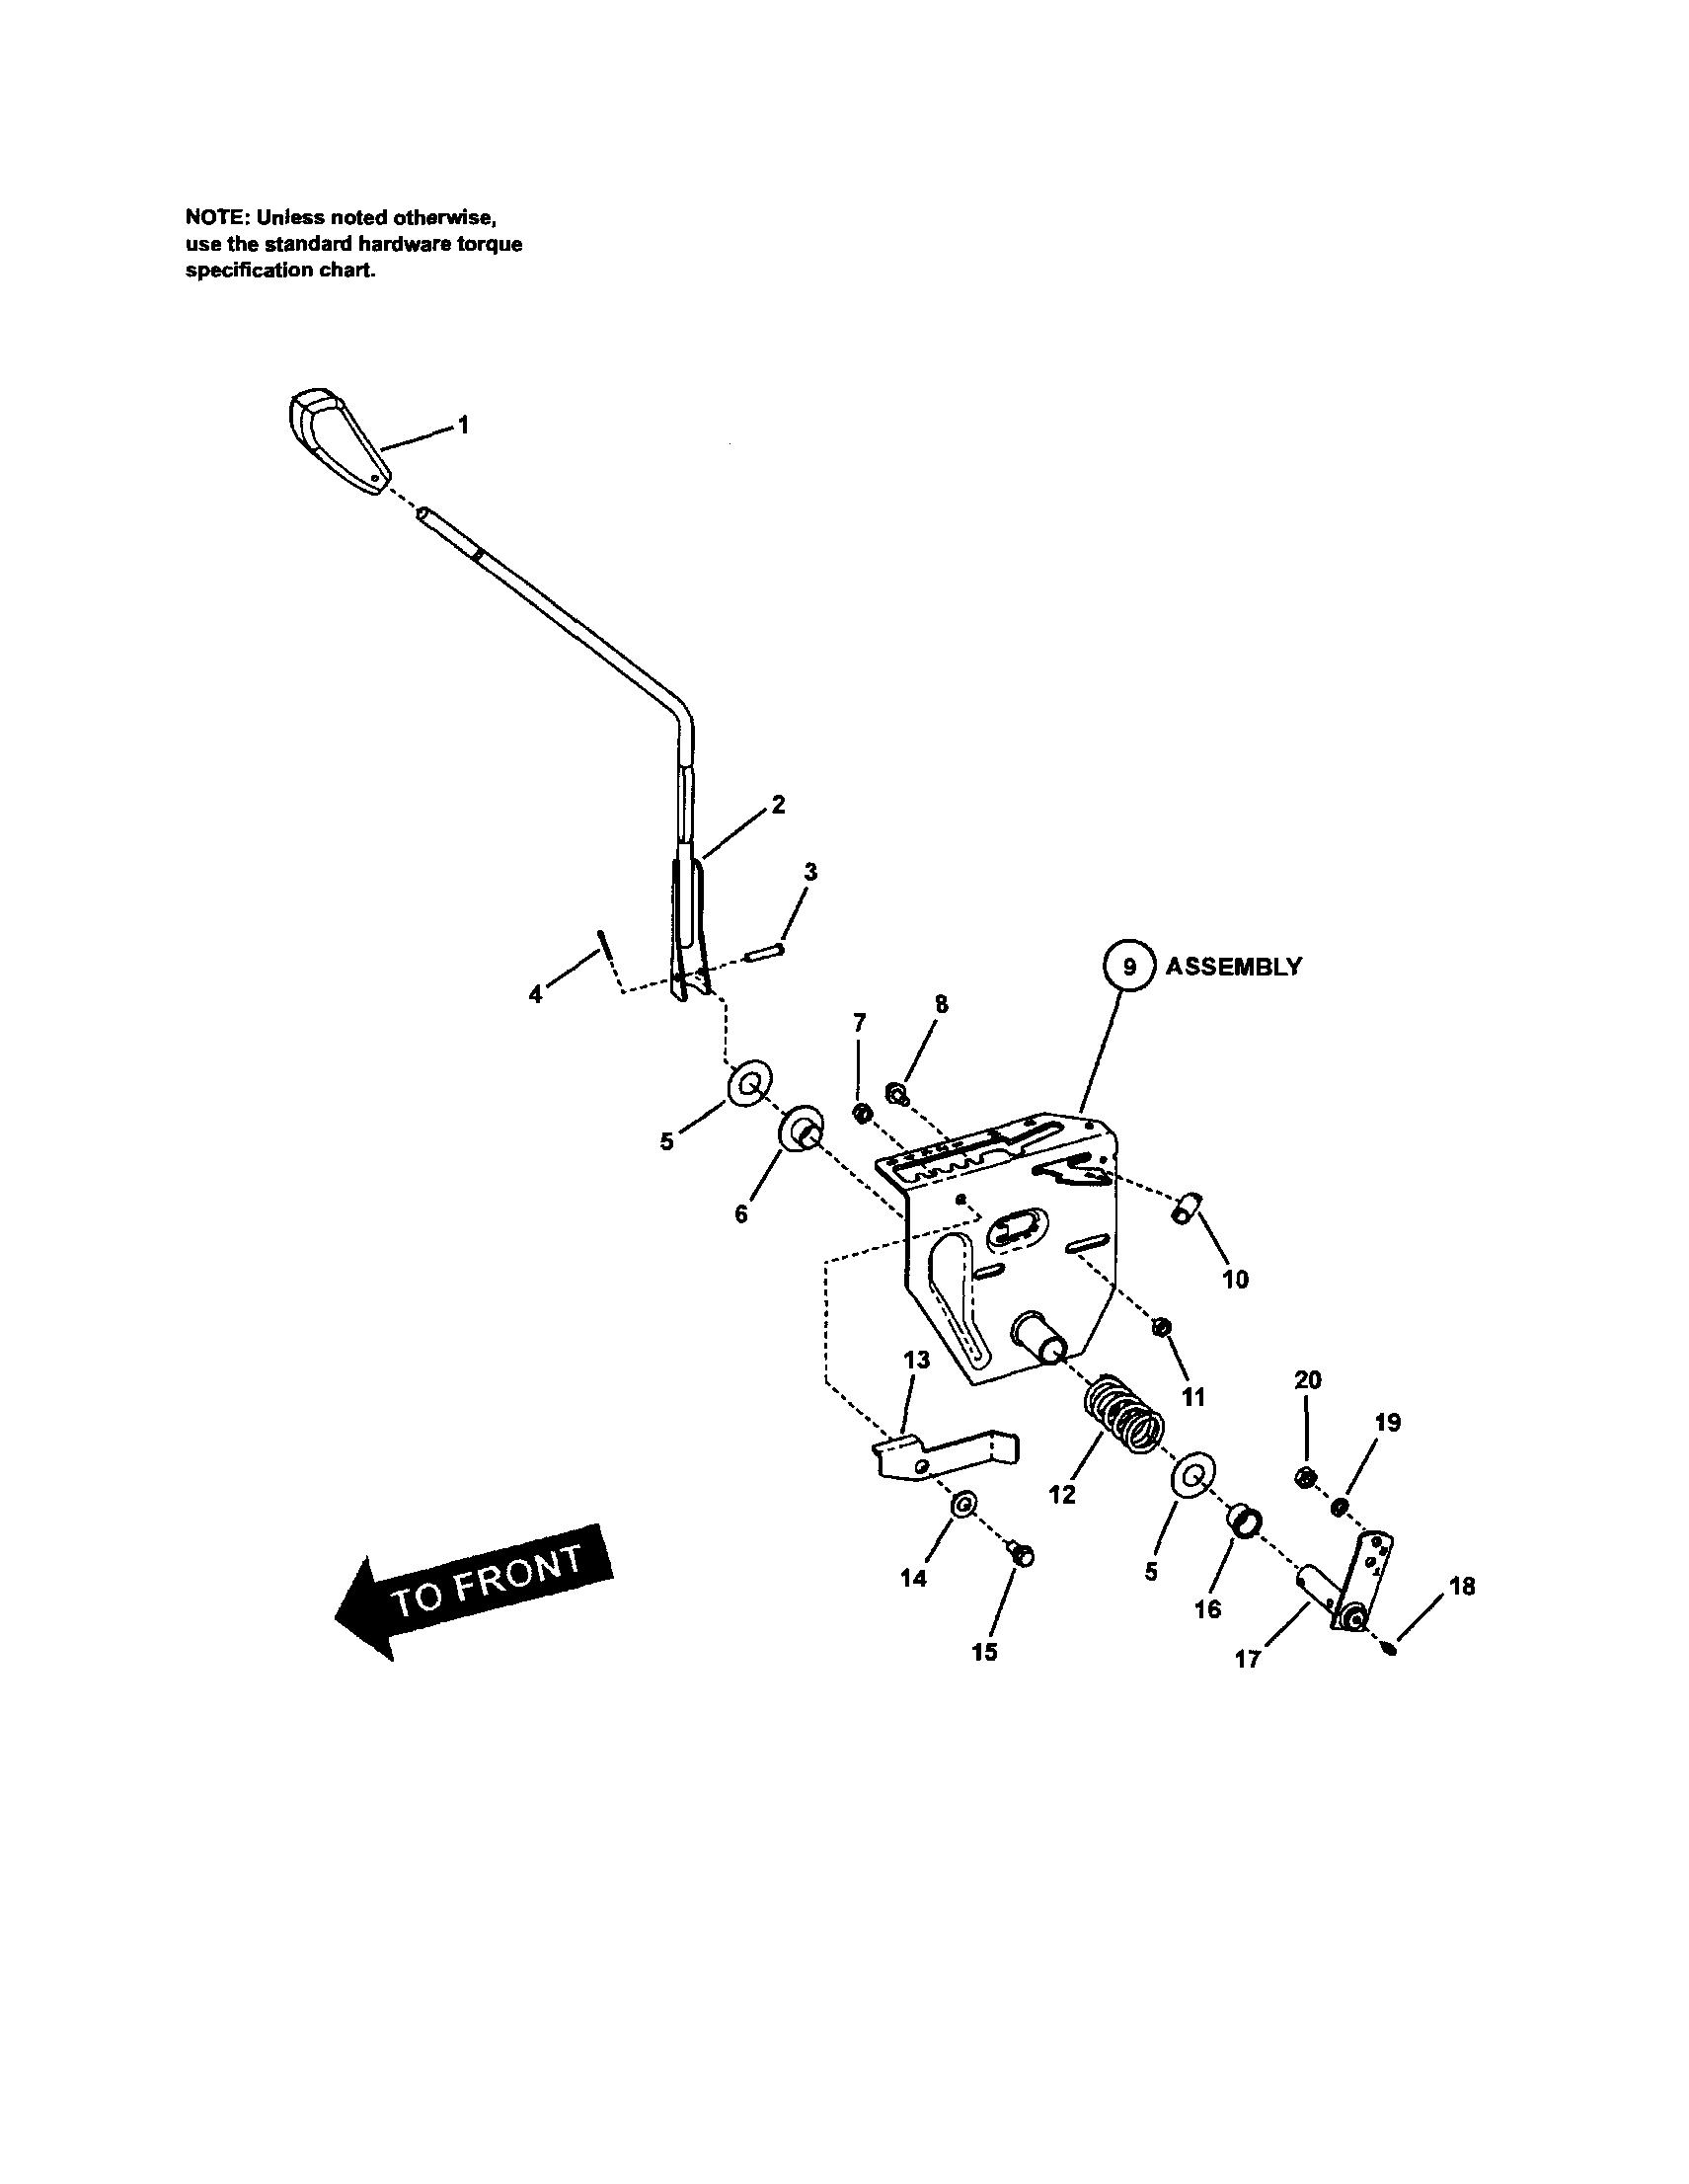 GEAR SHIFT Diagram & Parts List for Model 107280340